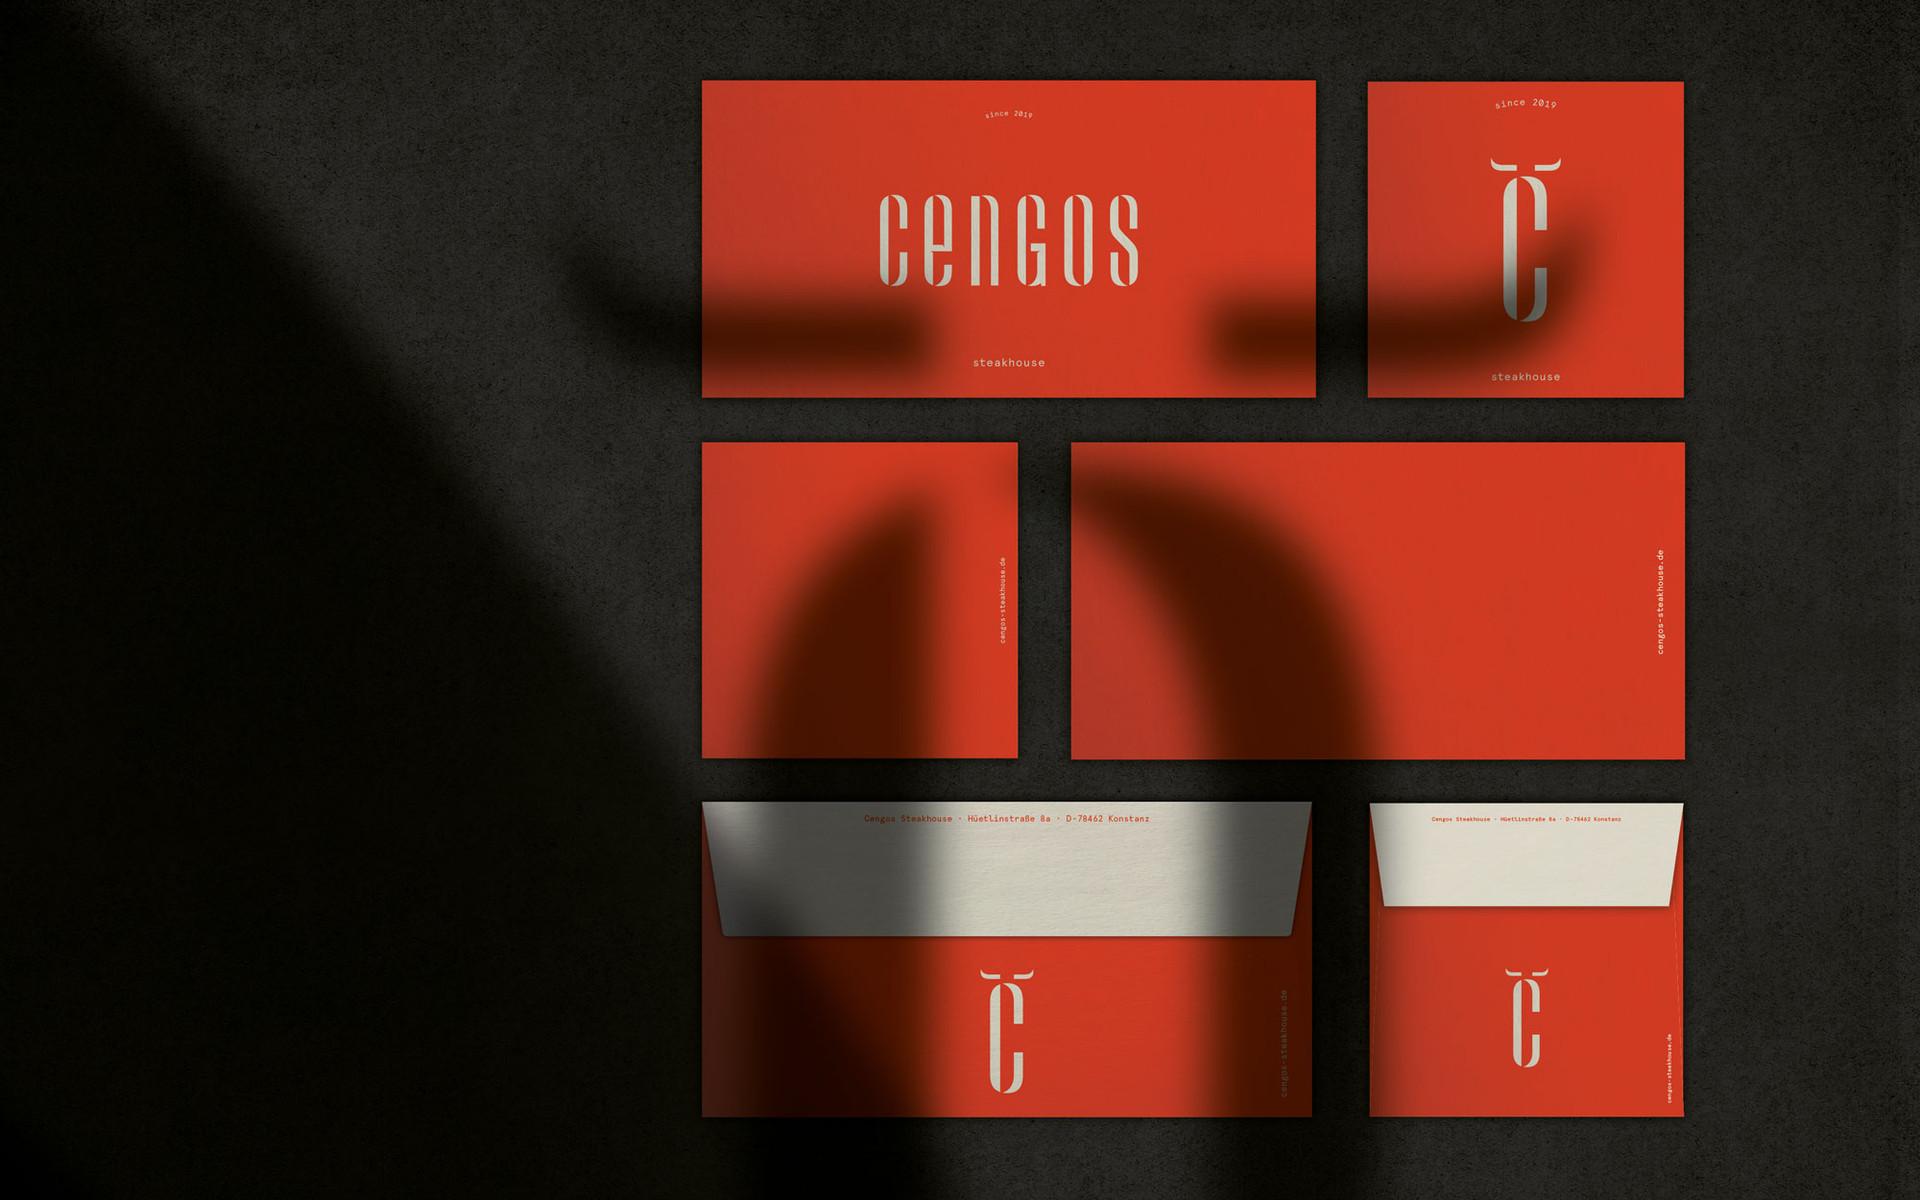 Cengos_04.jpg